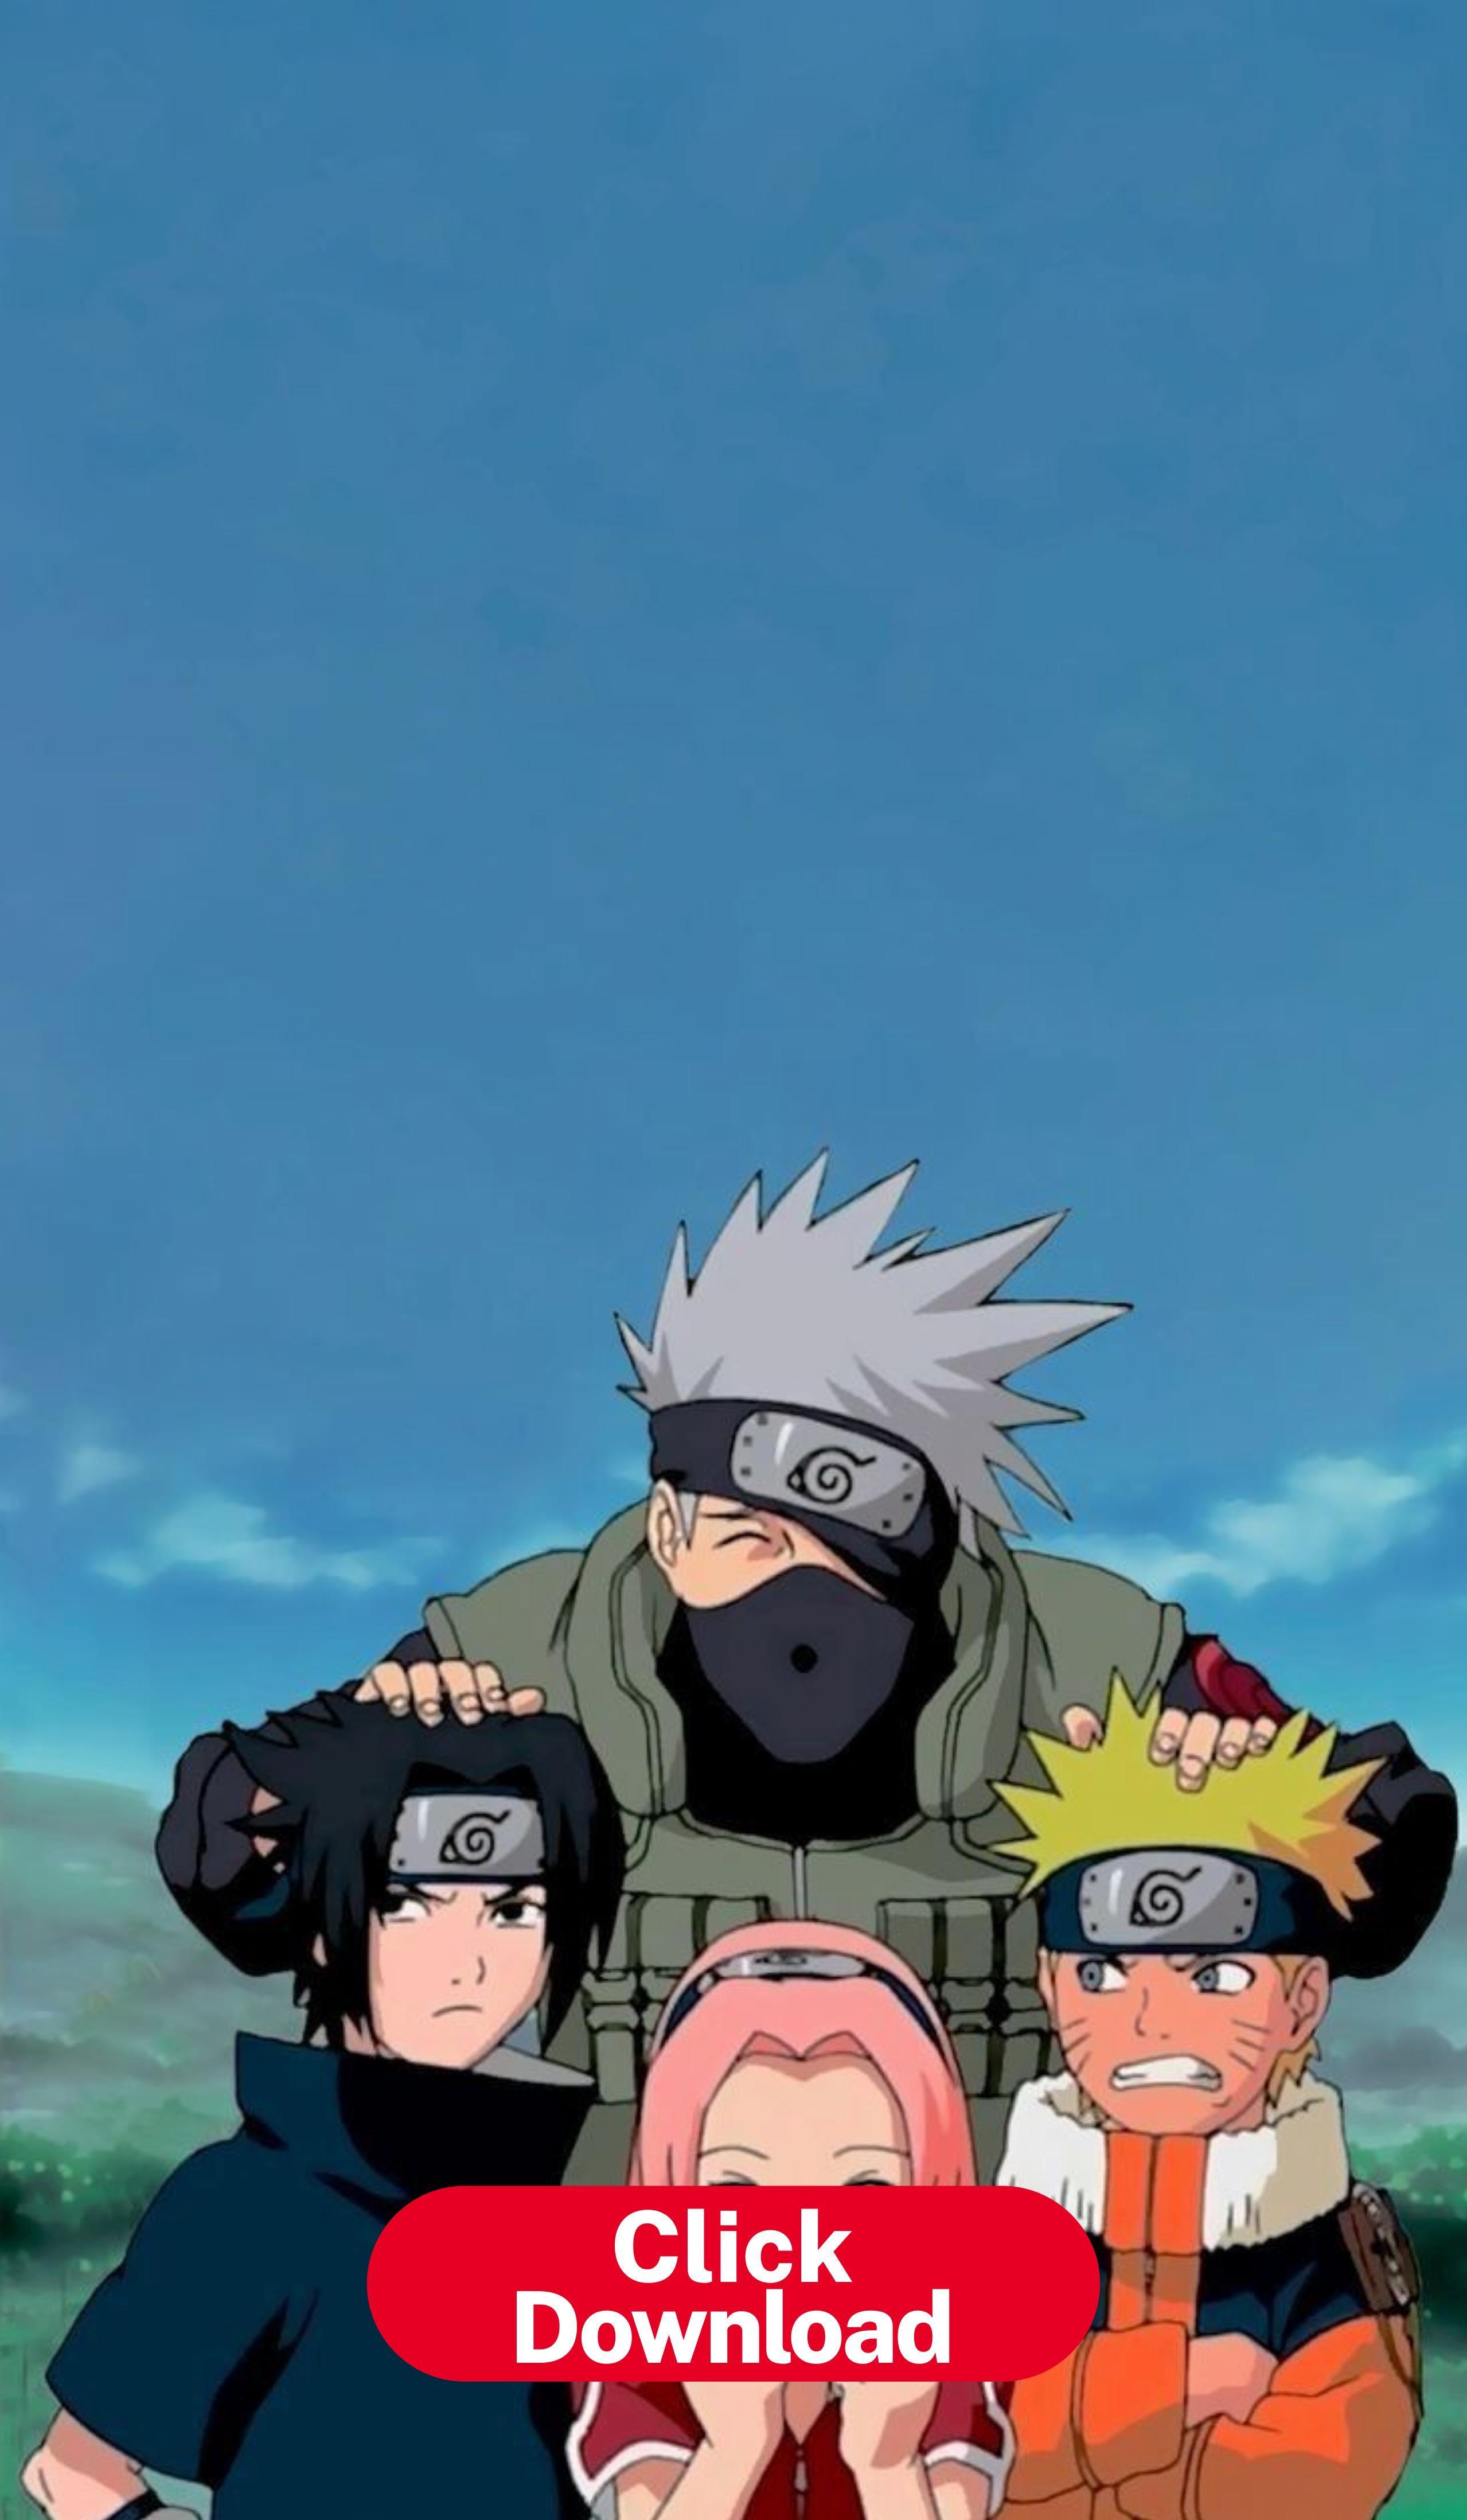 Team 7 Phone Wallpapers Top Free Team 7 Phone Backgrounds Naruto Naruto And Sasuke Wallpaper Wallpaper Naruto Shippuden